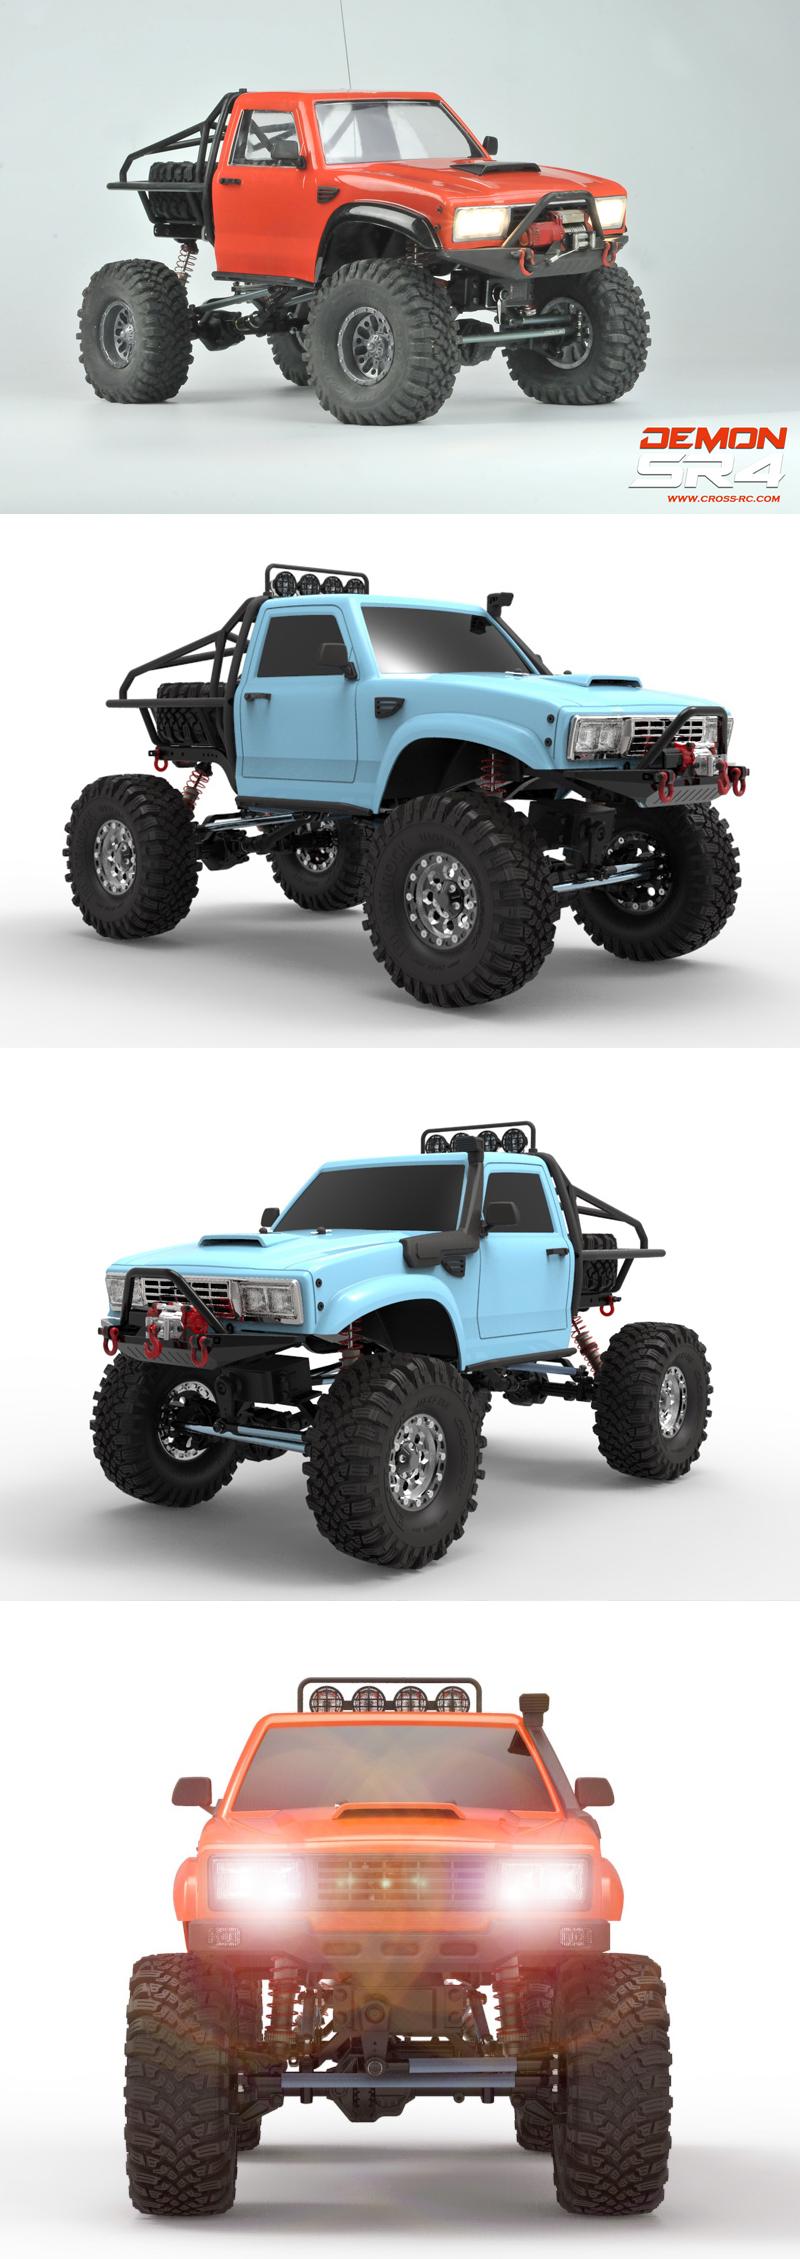 SR4C Demon 4x4 Crawler Kit, w/ LEXAN Body 1/10 Scale